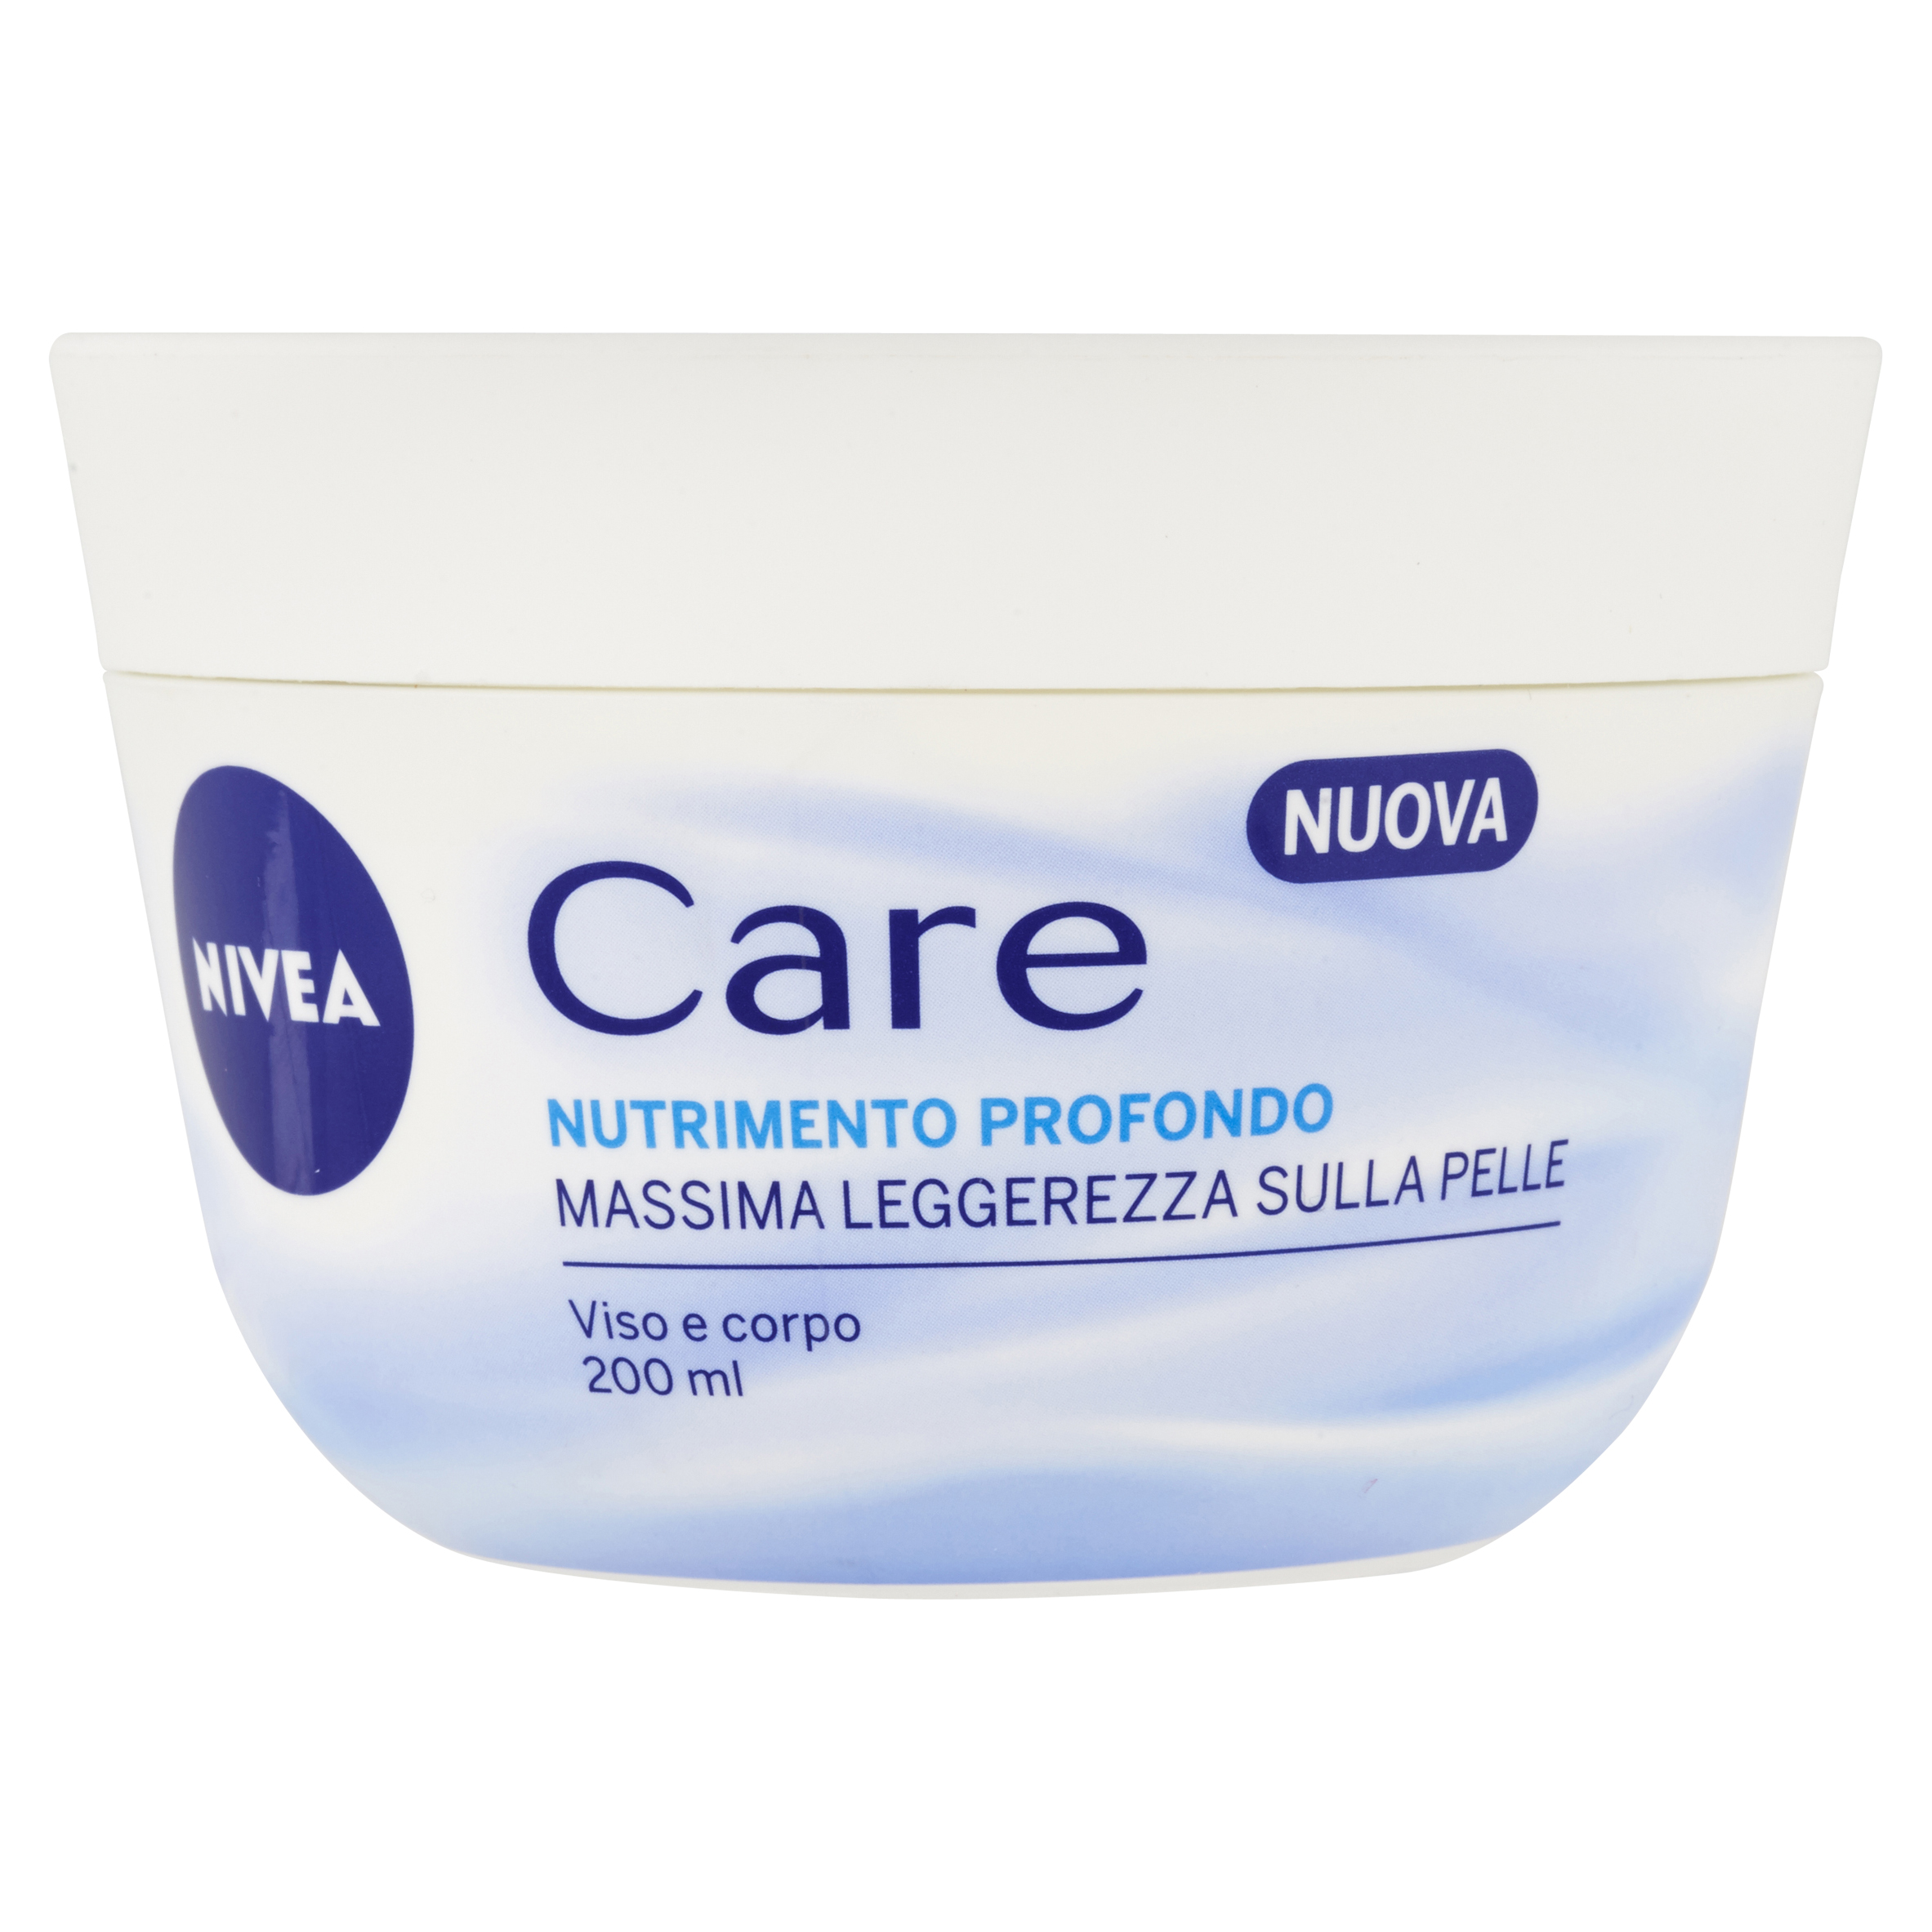 NIVEA CREME CARE  200 ML